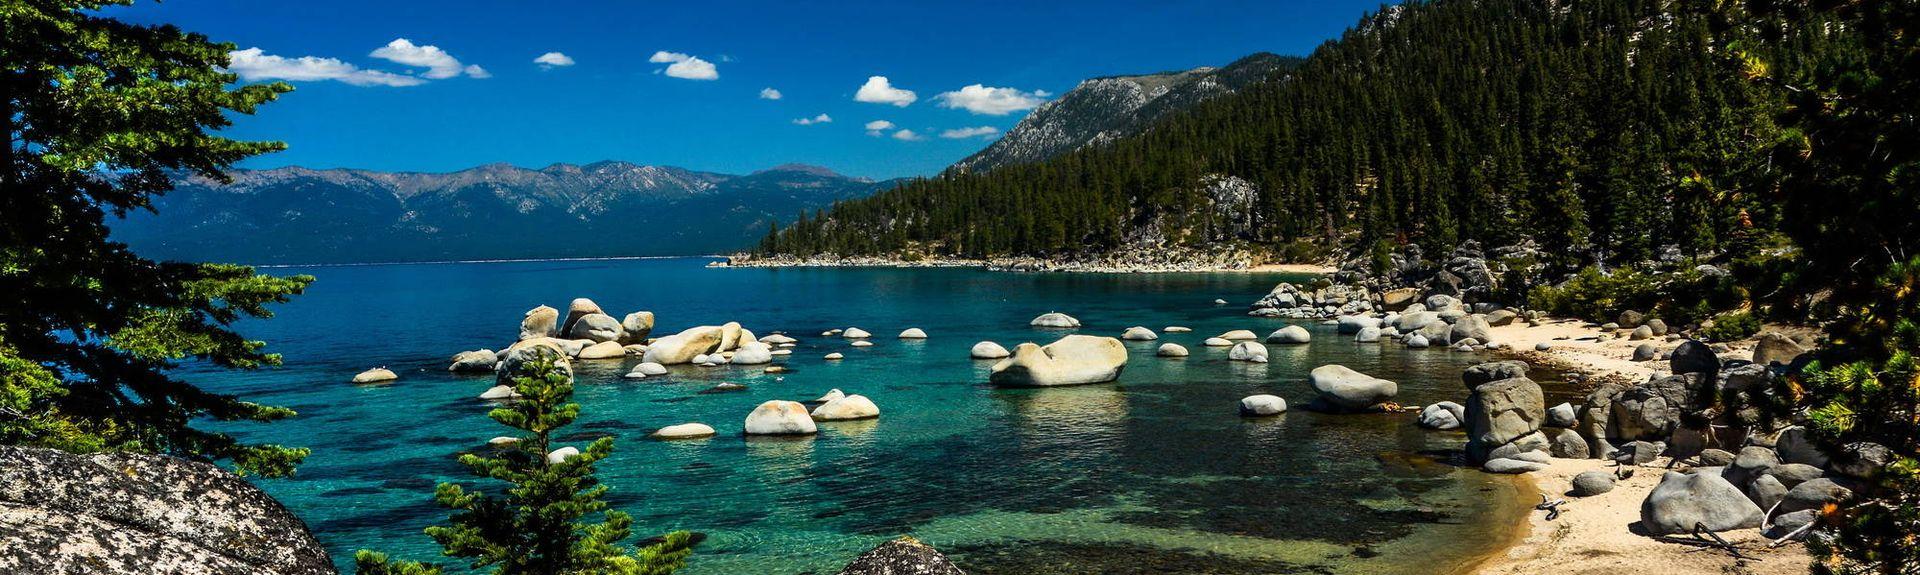 Vrbo | Reno, NV Vacation Rentals: house rentals & more